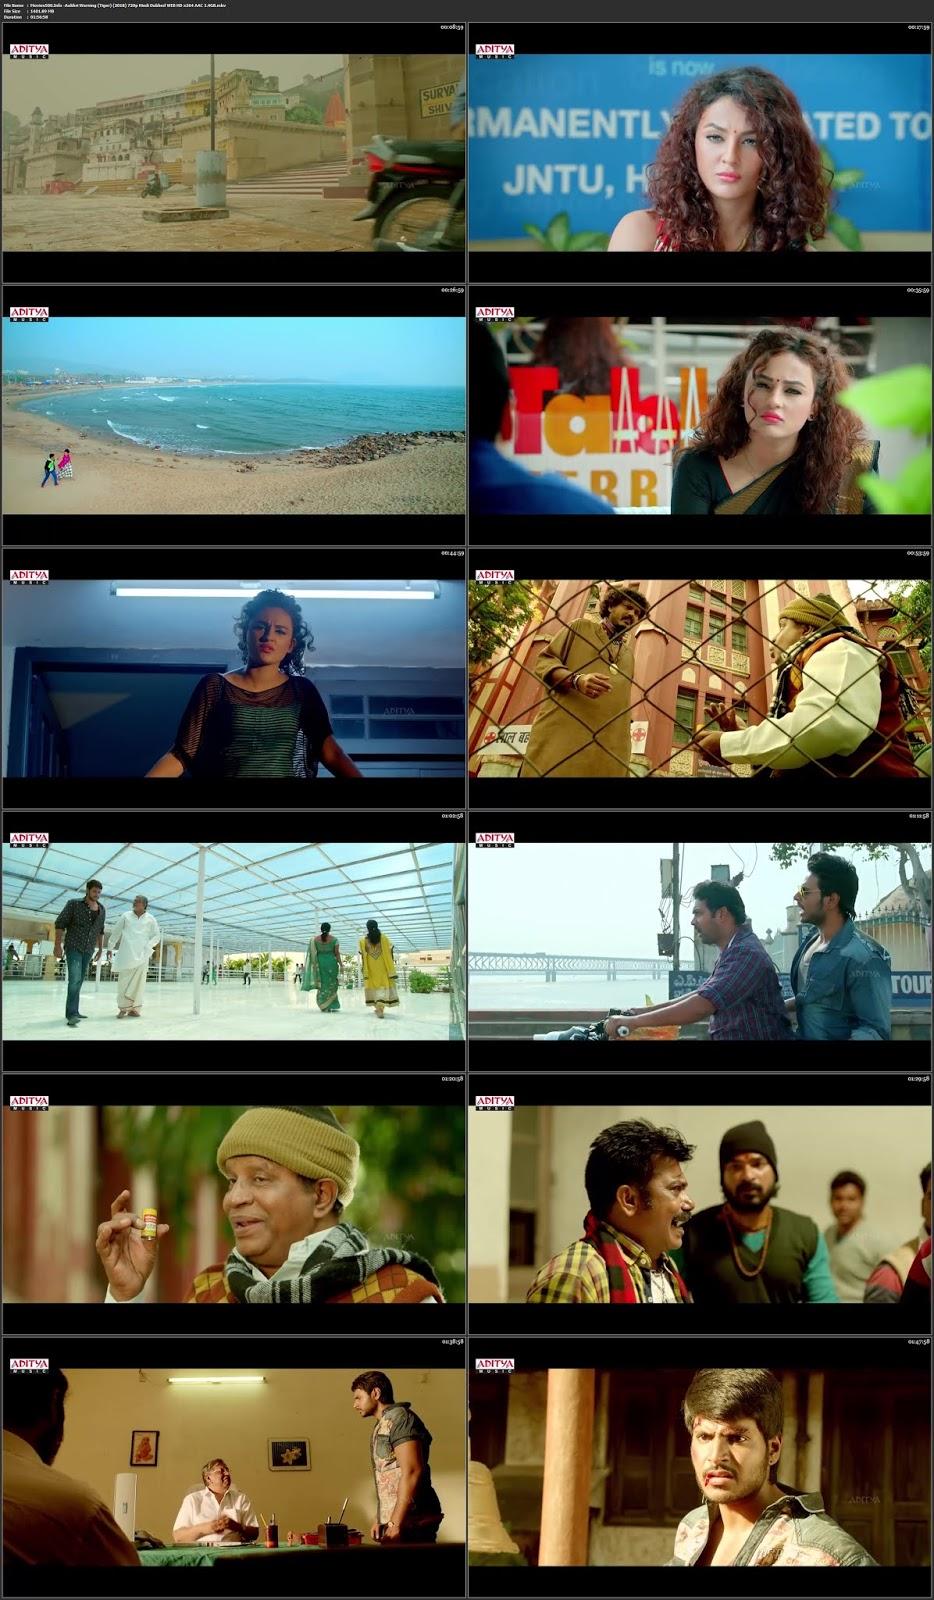 Aakhiri Warring (Tiger) 2018 Hindi Dubbed HDRip 720p